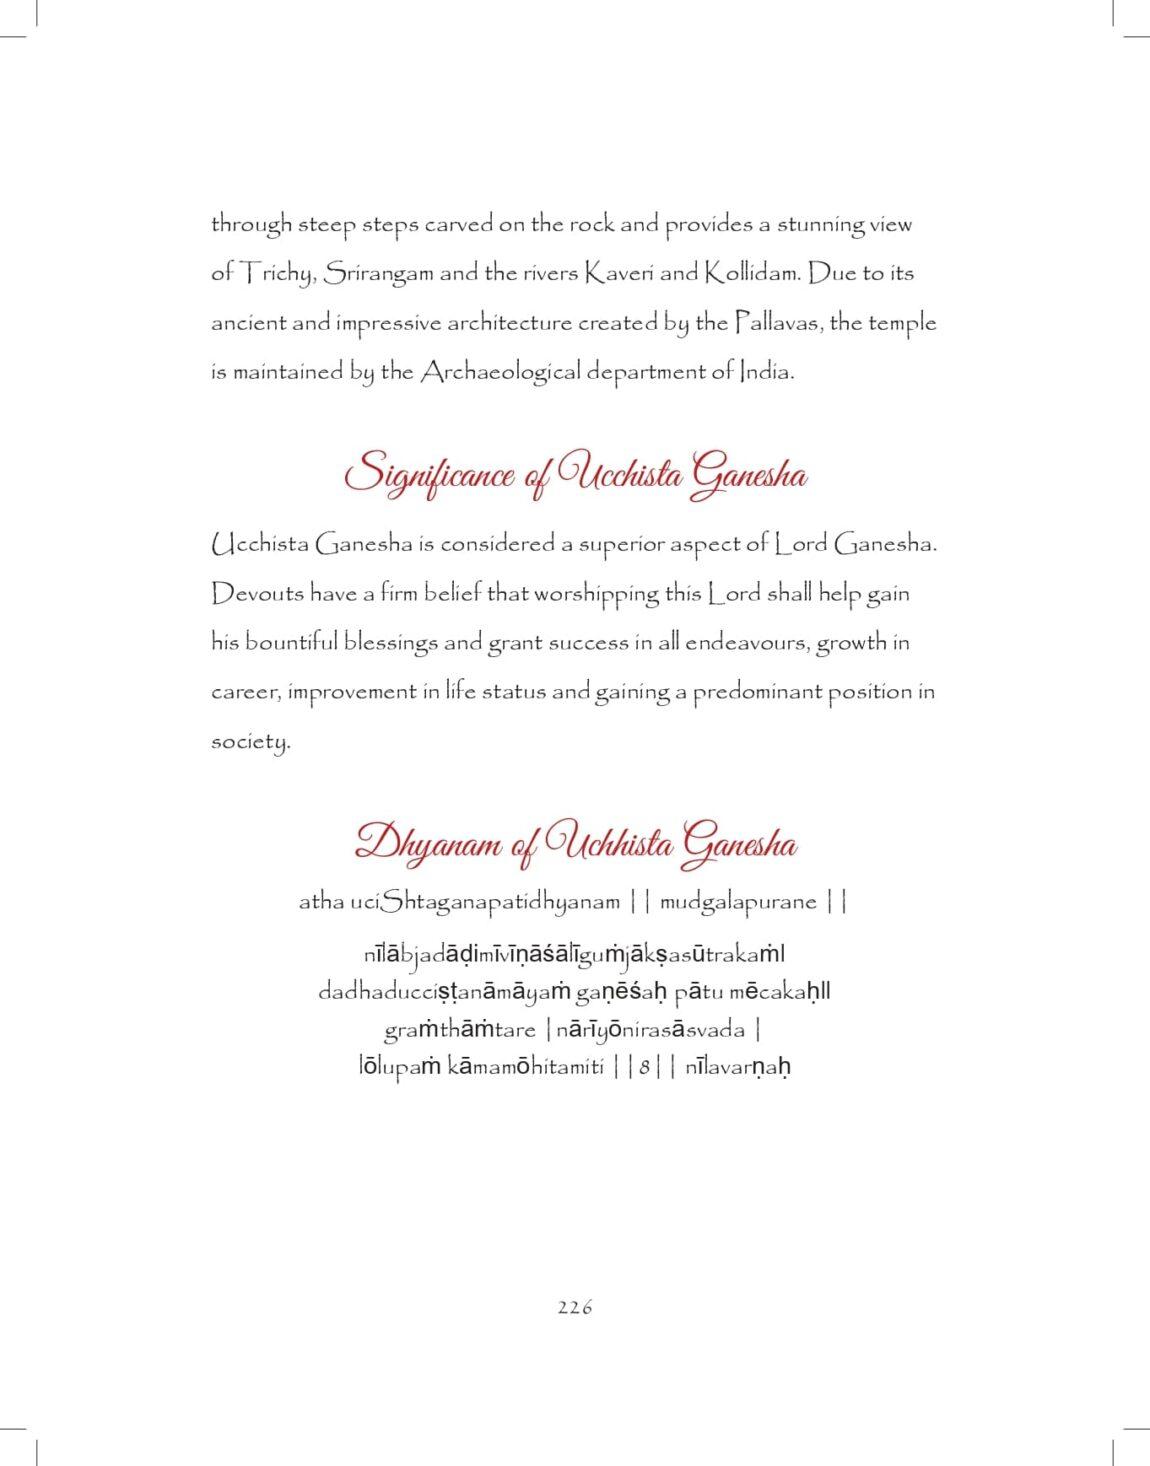 Ganesh-print_pages-to-jpg-0226.jpg